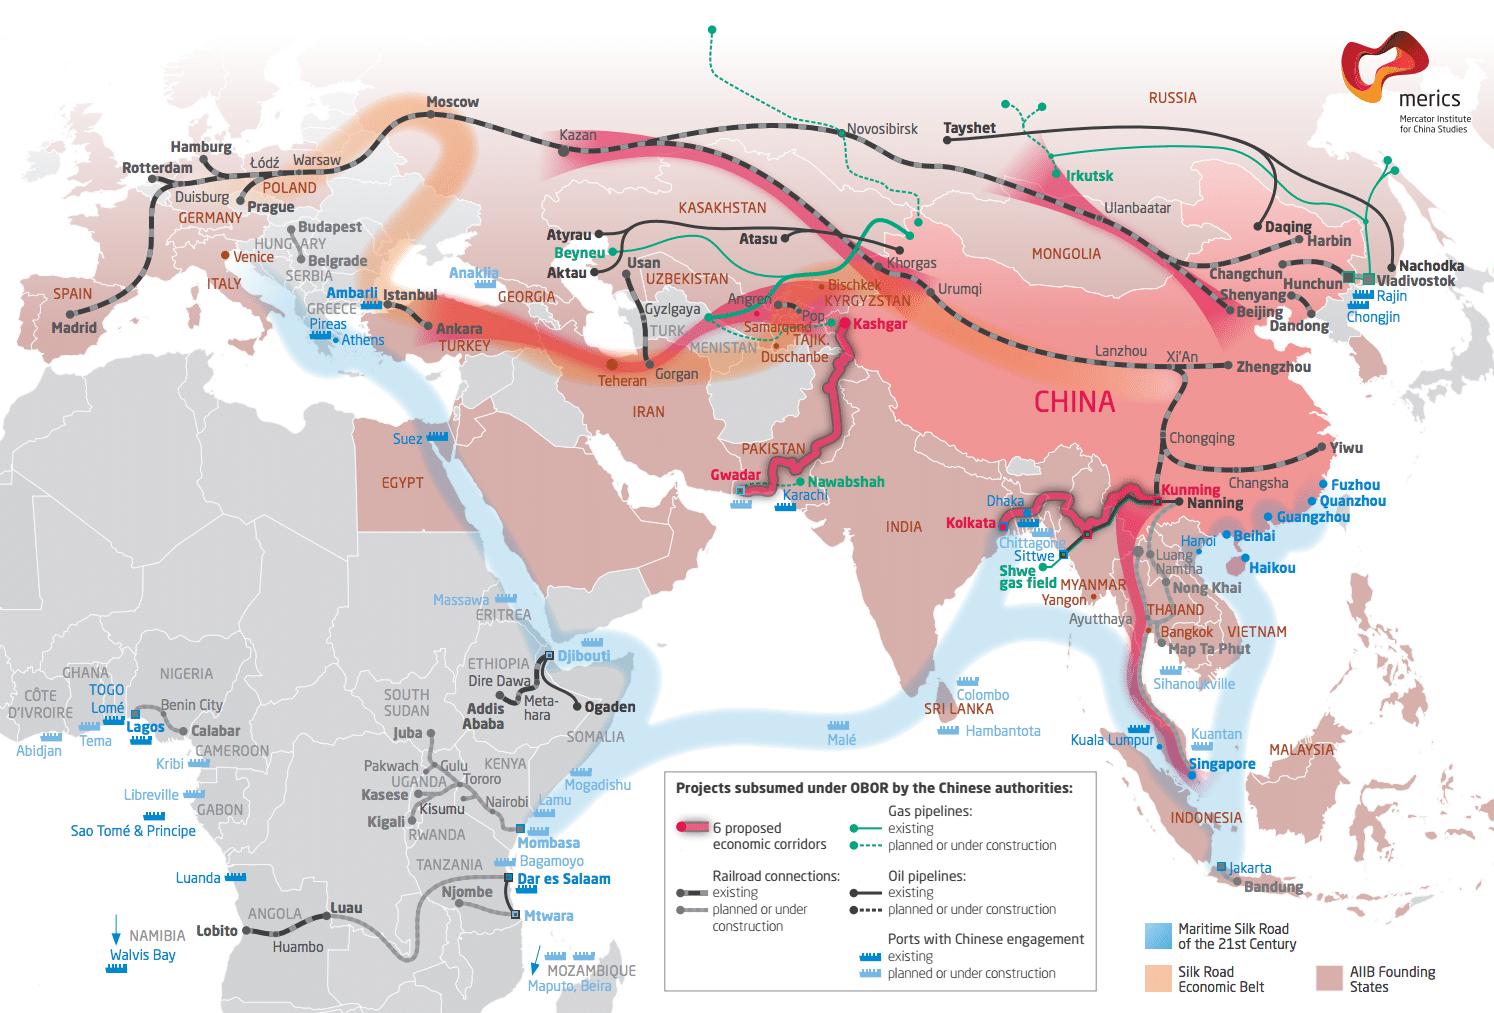 Europe Road Map 2017